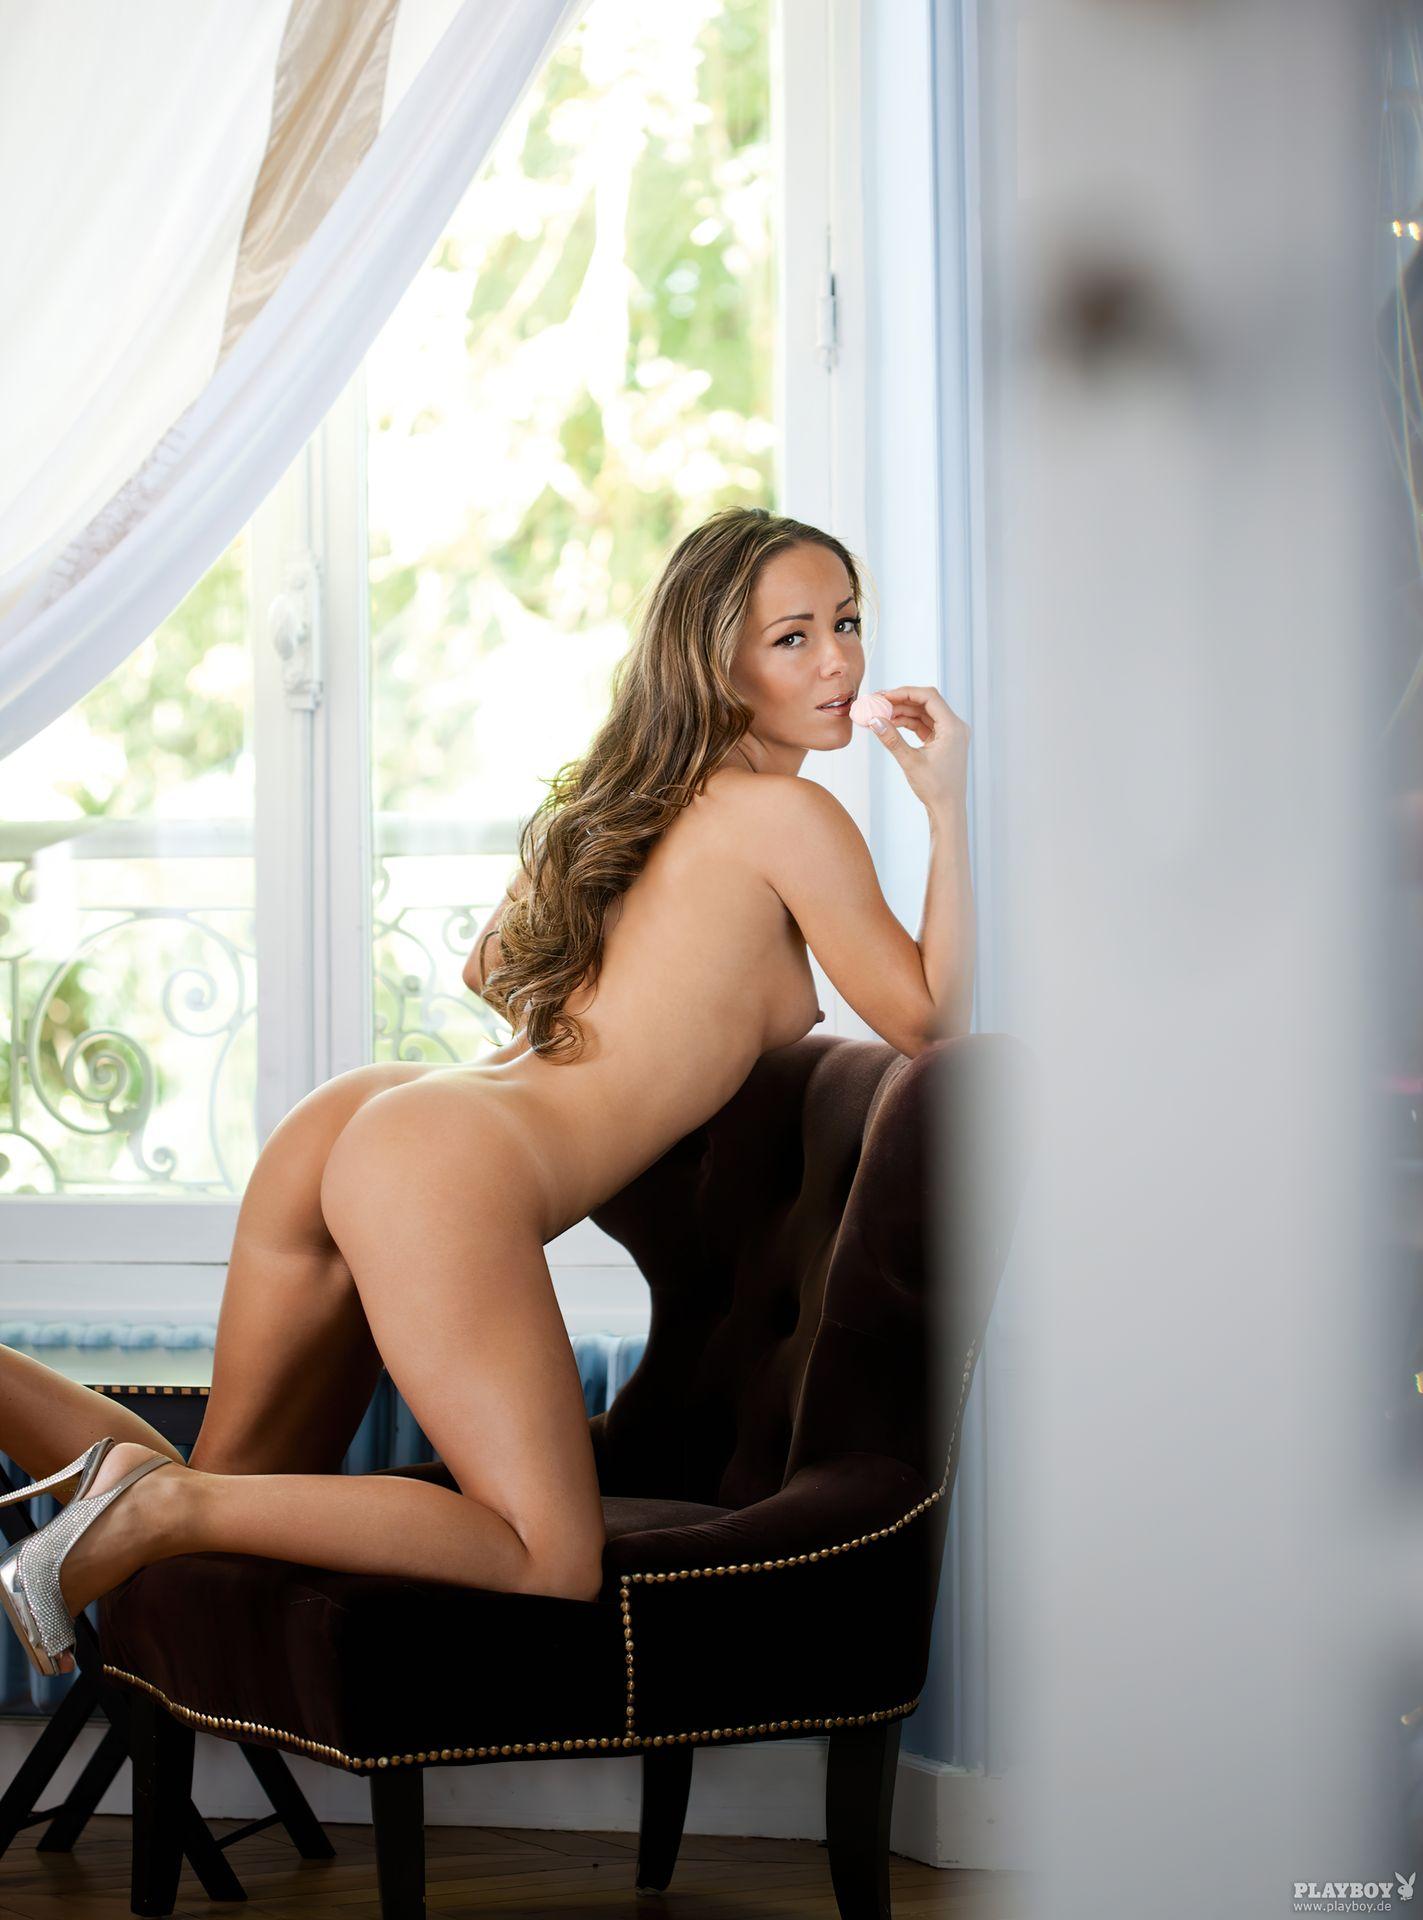 Nathalie Cassegrain Nude – Playboy 0024